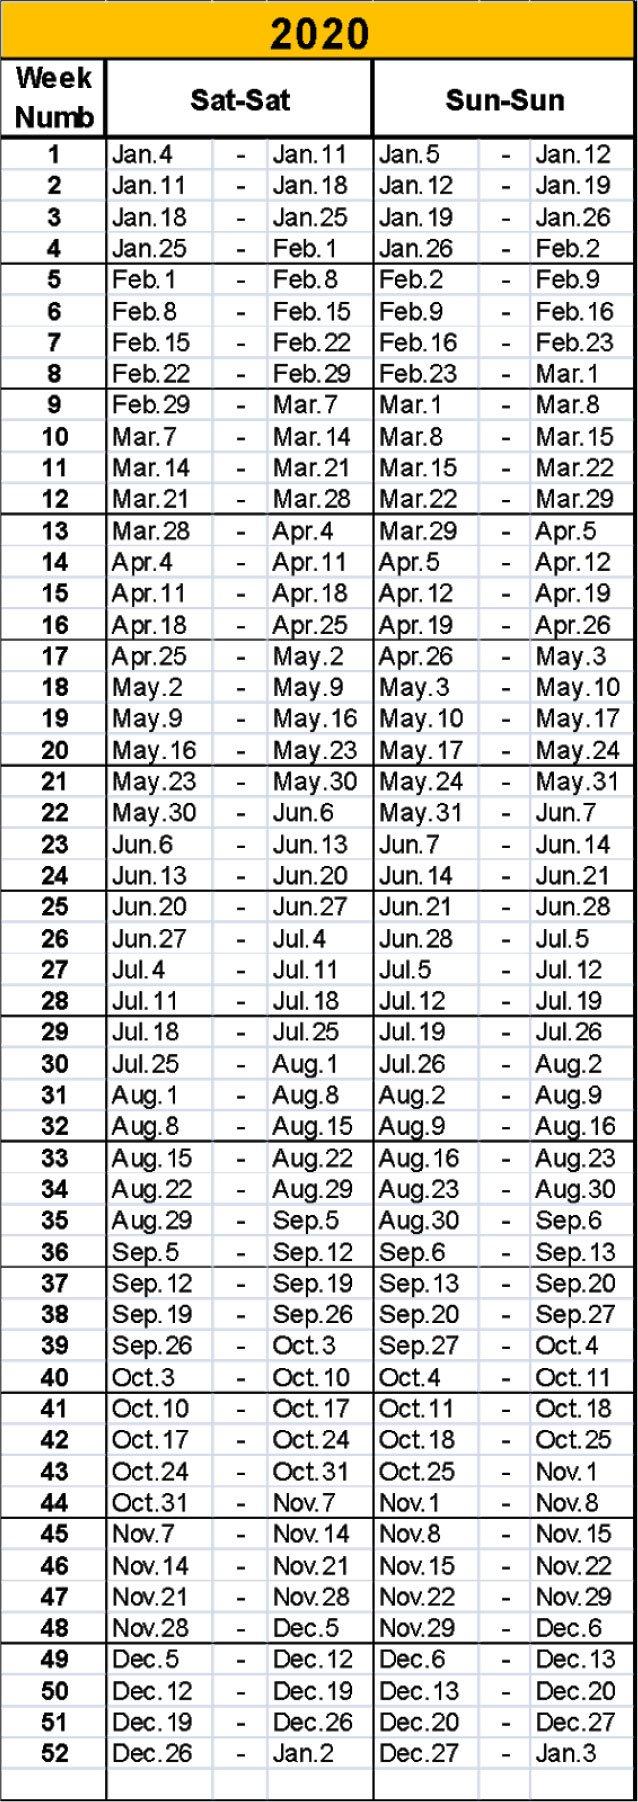 Timeshare Calendar 2020 | Free Printable Calendar Printable 2020 Calendar Free Saturday To Friday